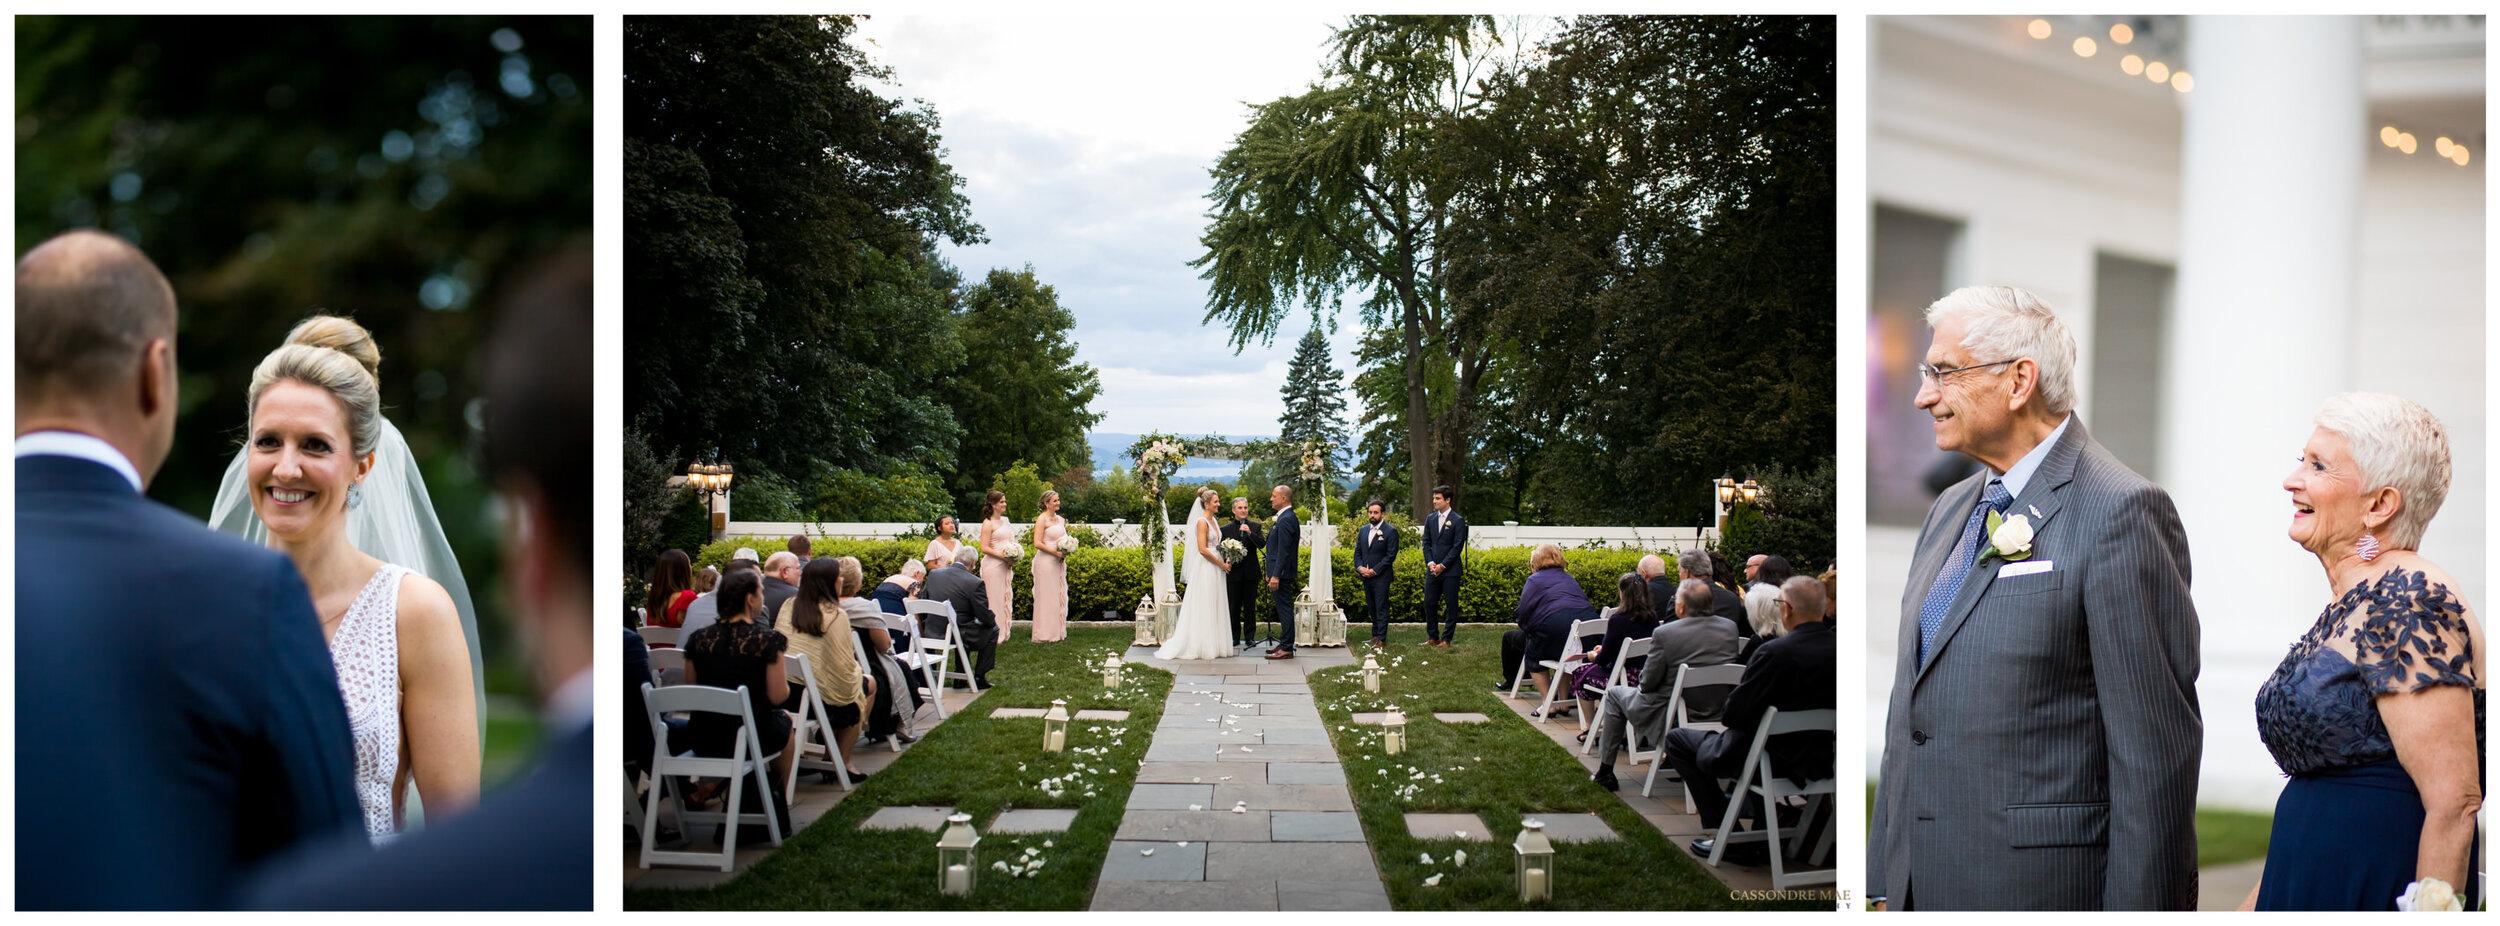 Cassondre Mae Photography Briarcliff Manor Wedding Photographer 8.jpg